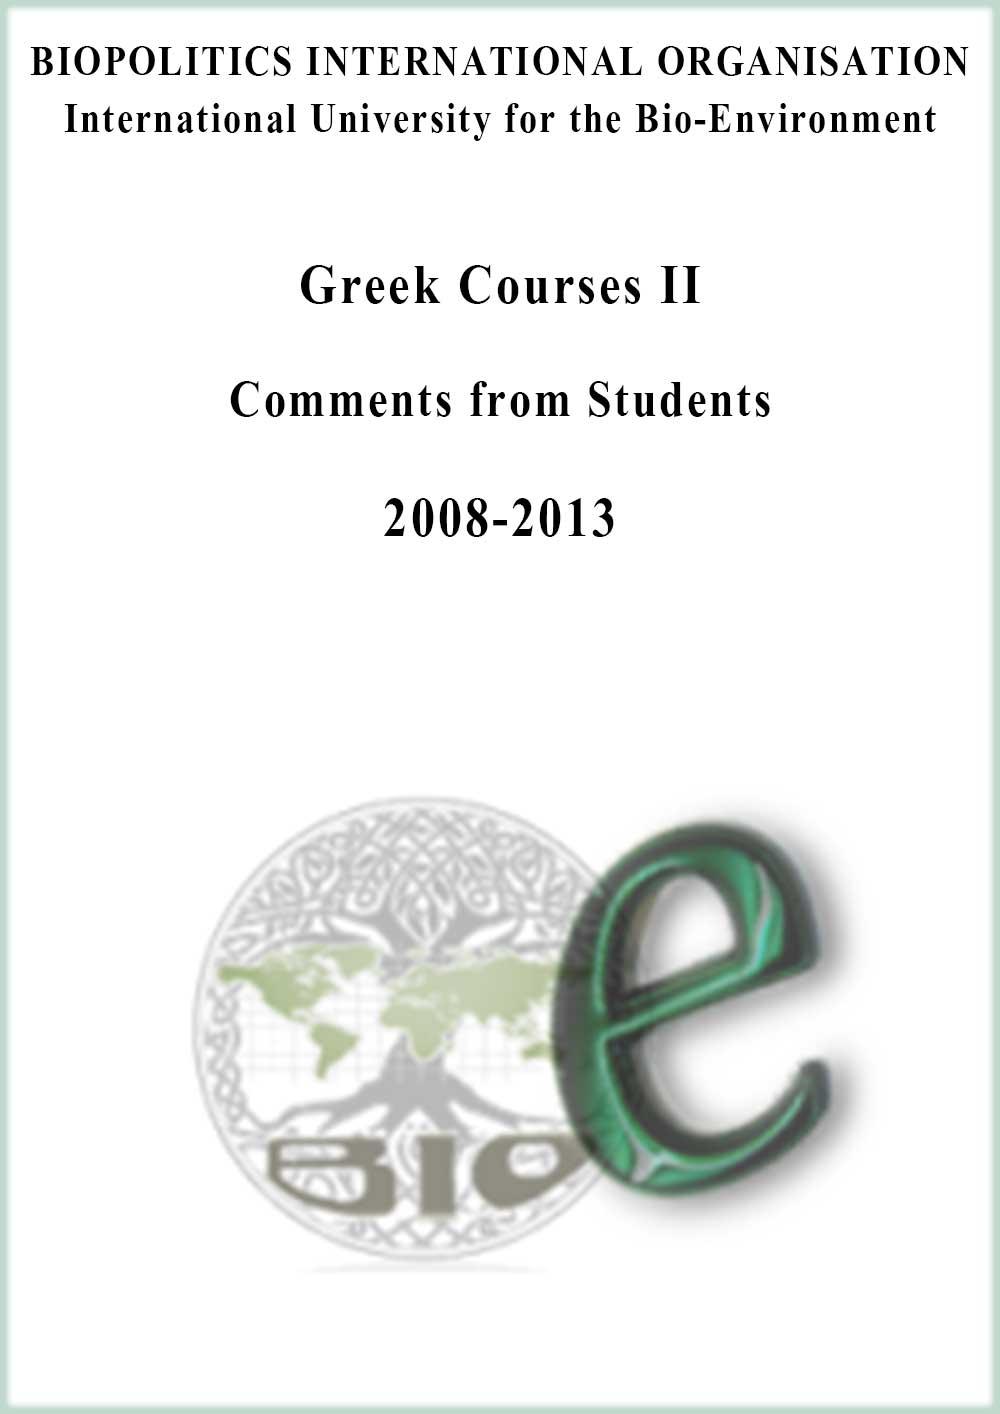 E-comments cover eng